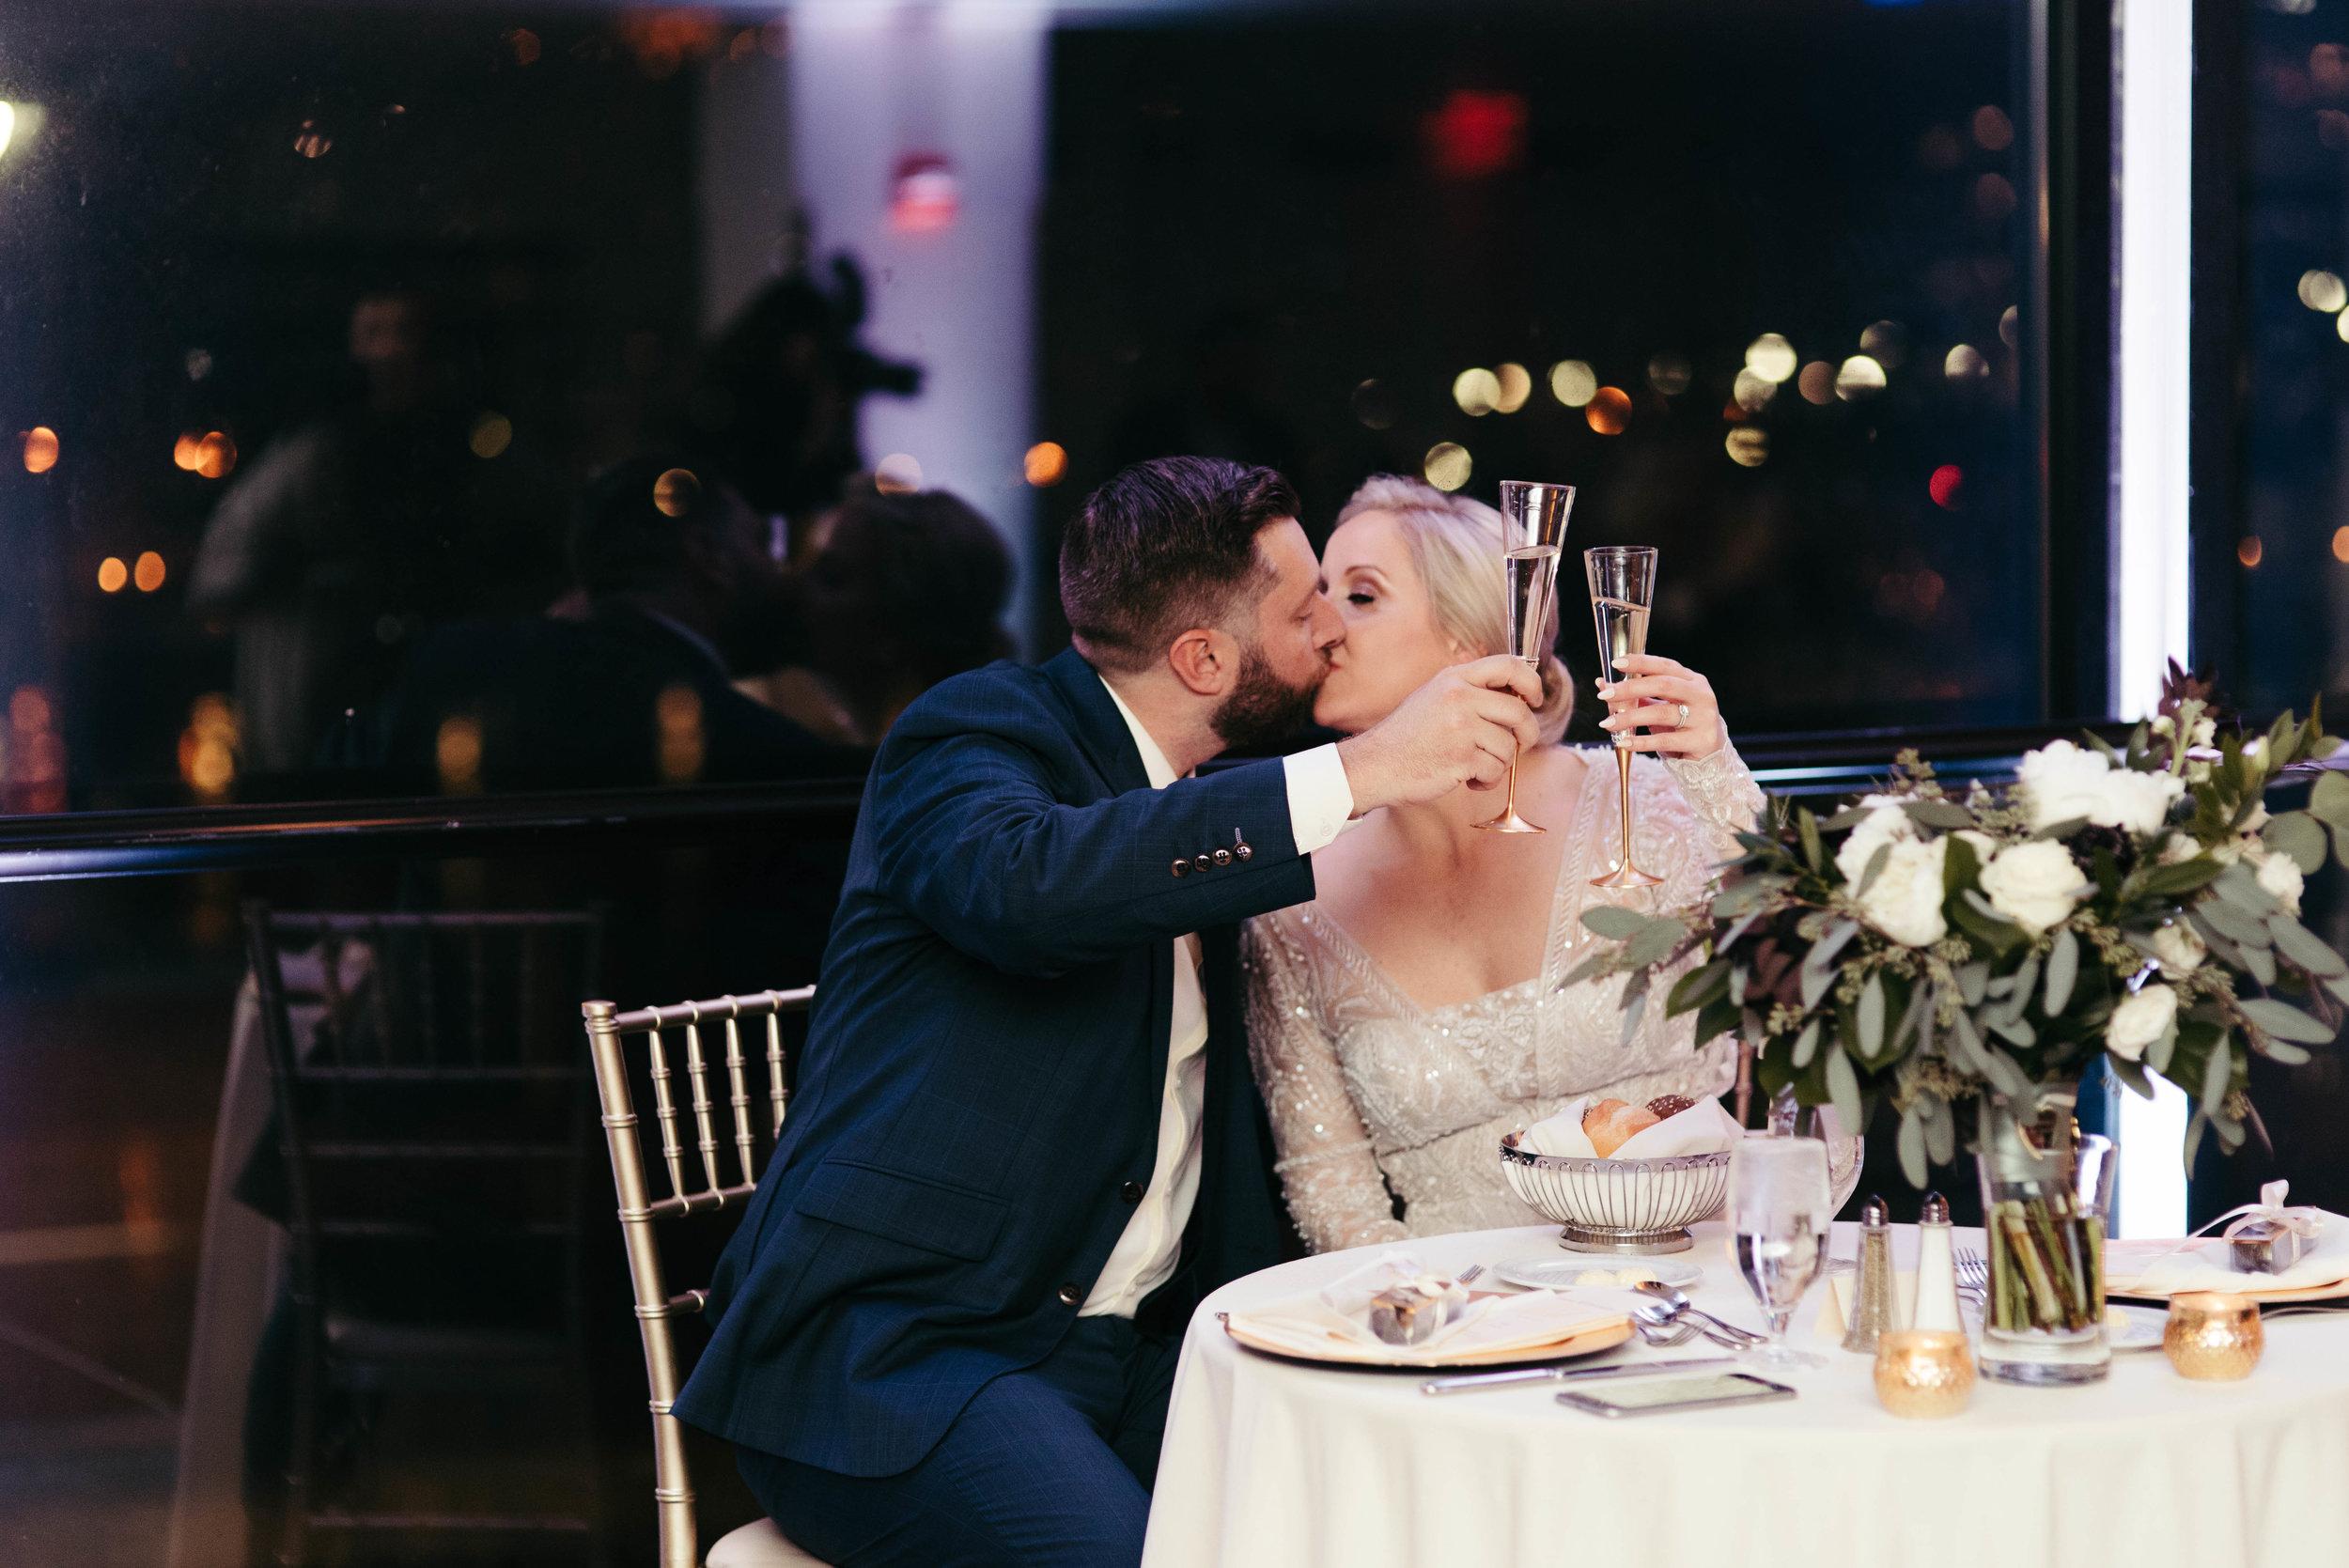 renaissance hotel wedding photos-50.jpg